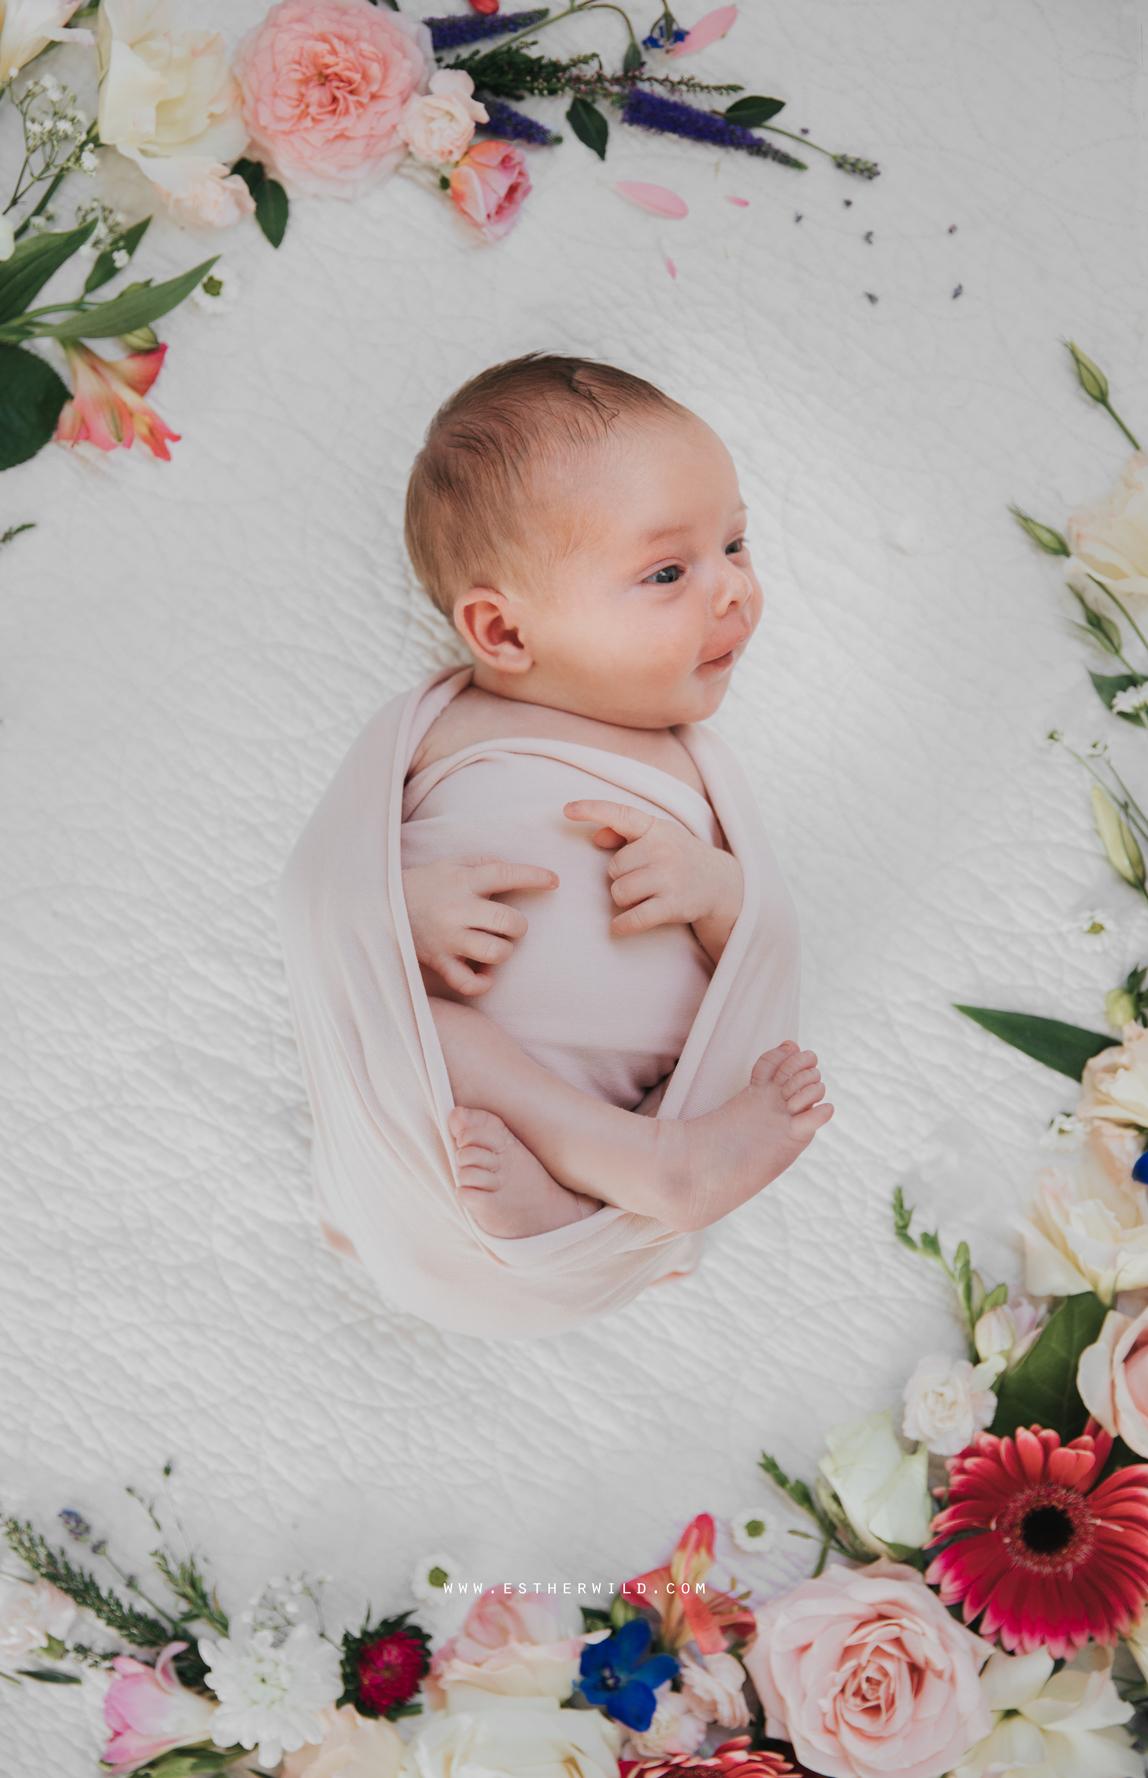 Newborn_Family_Photographer_Home_Norfolk_Newborn_Family_Photographer_Home_Norfolk_3R8A3719.jpg